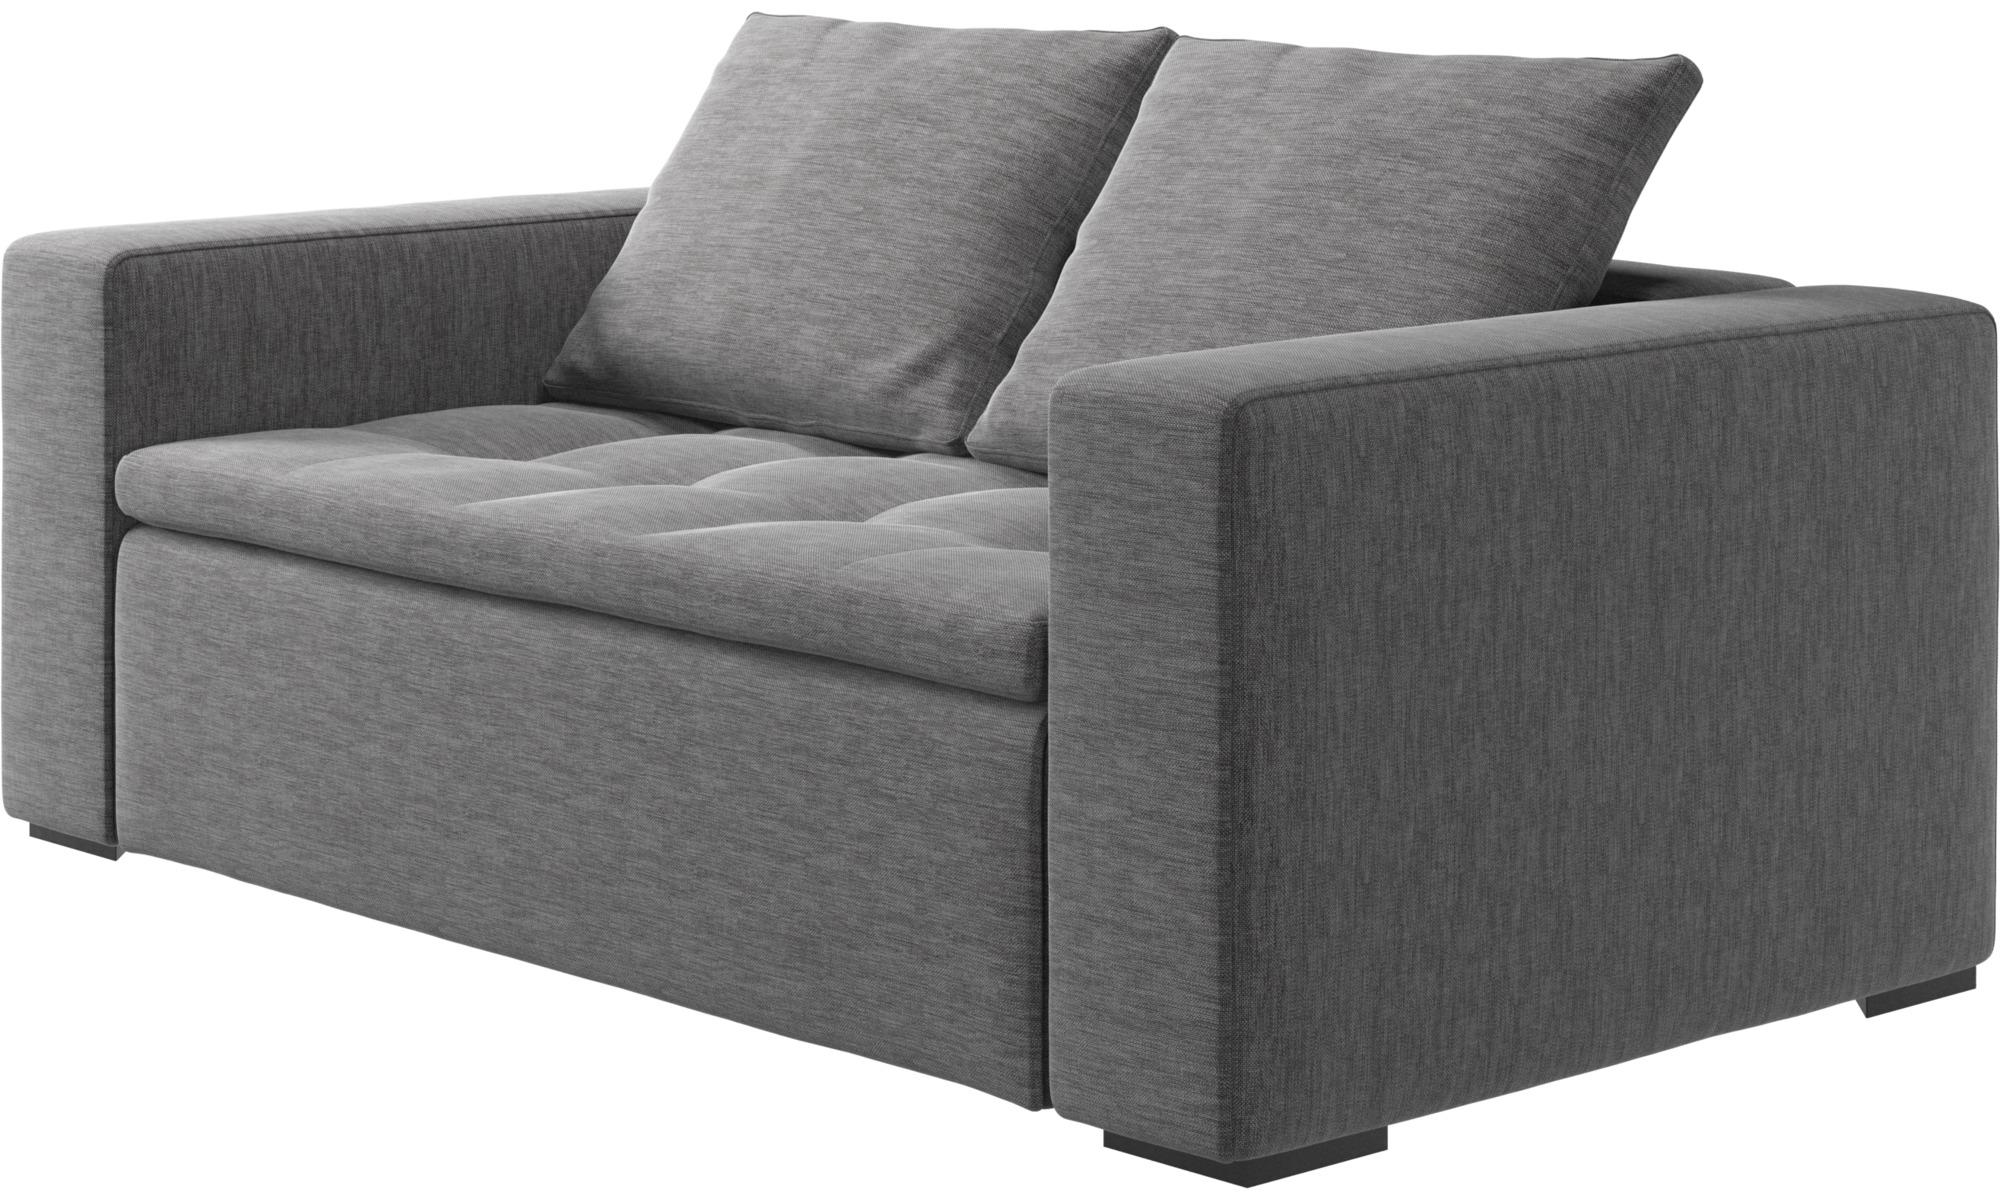 2 seater sofas mezzo sofa boconcept. Black Bedroom Furniture Sets. Home Design Ideas